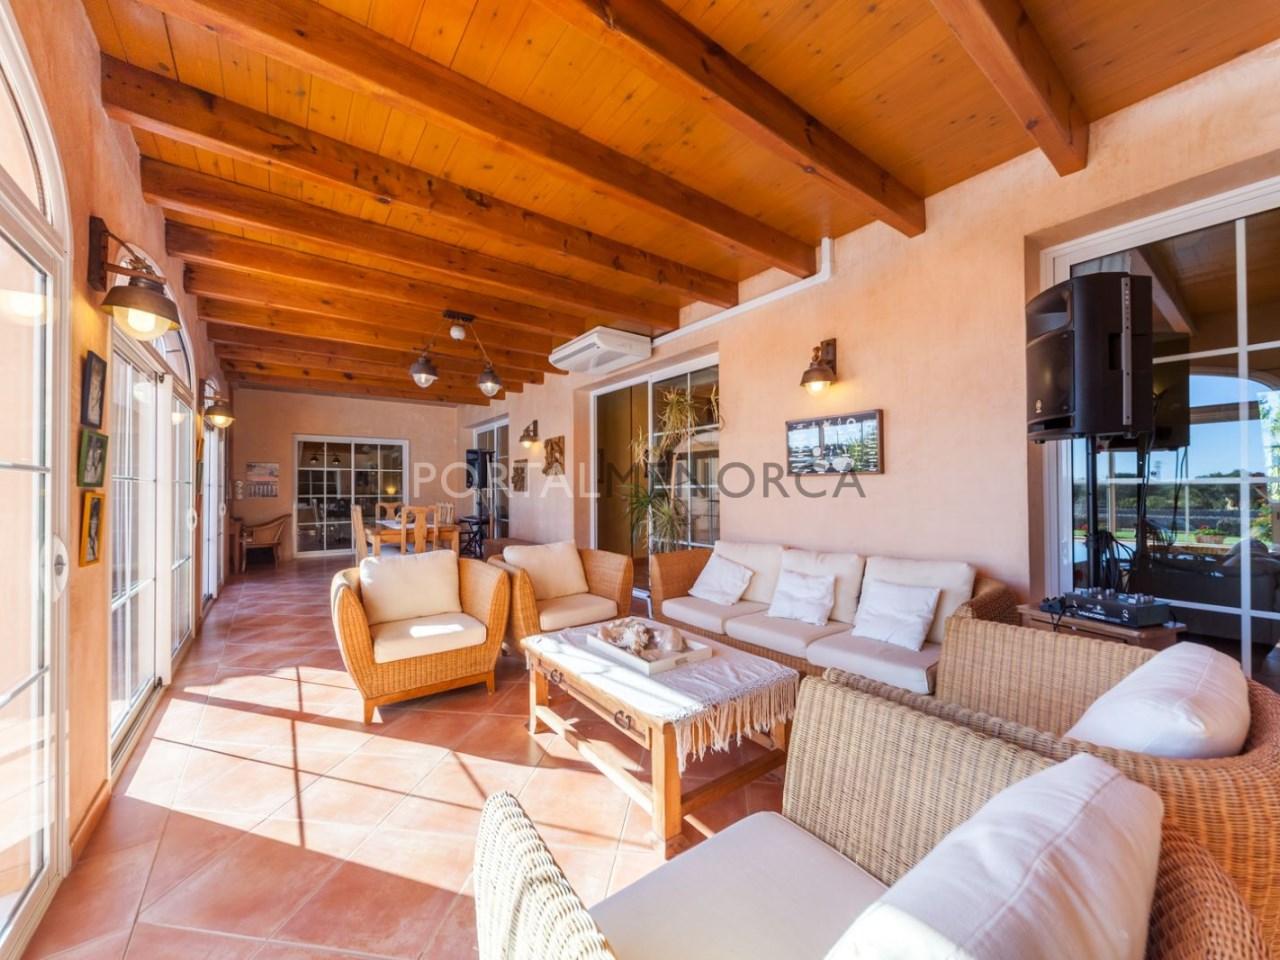 Casa de campo con piscina en Menorca (14 de 41)